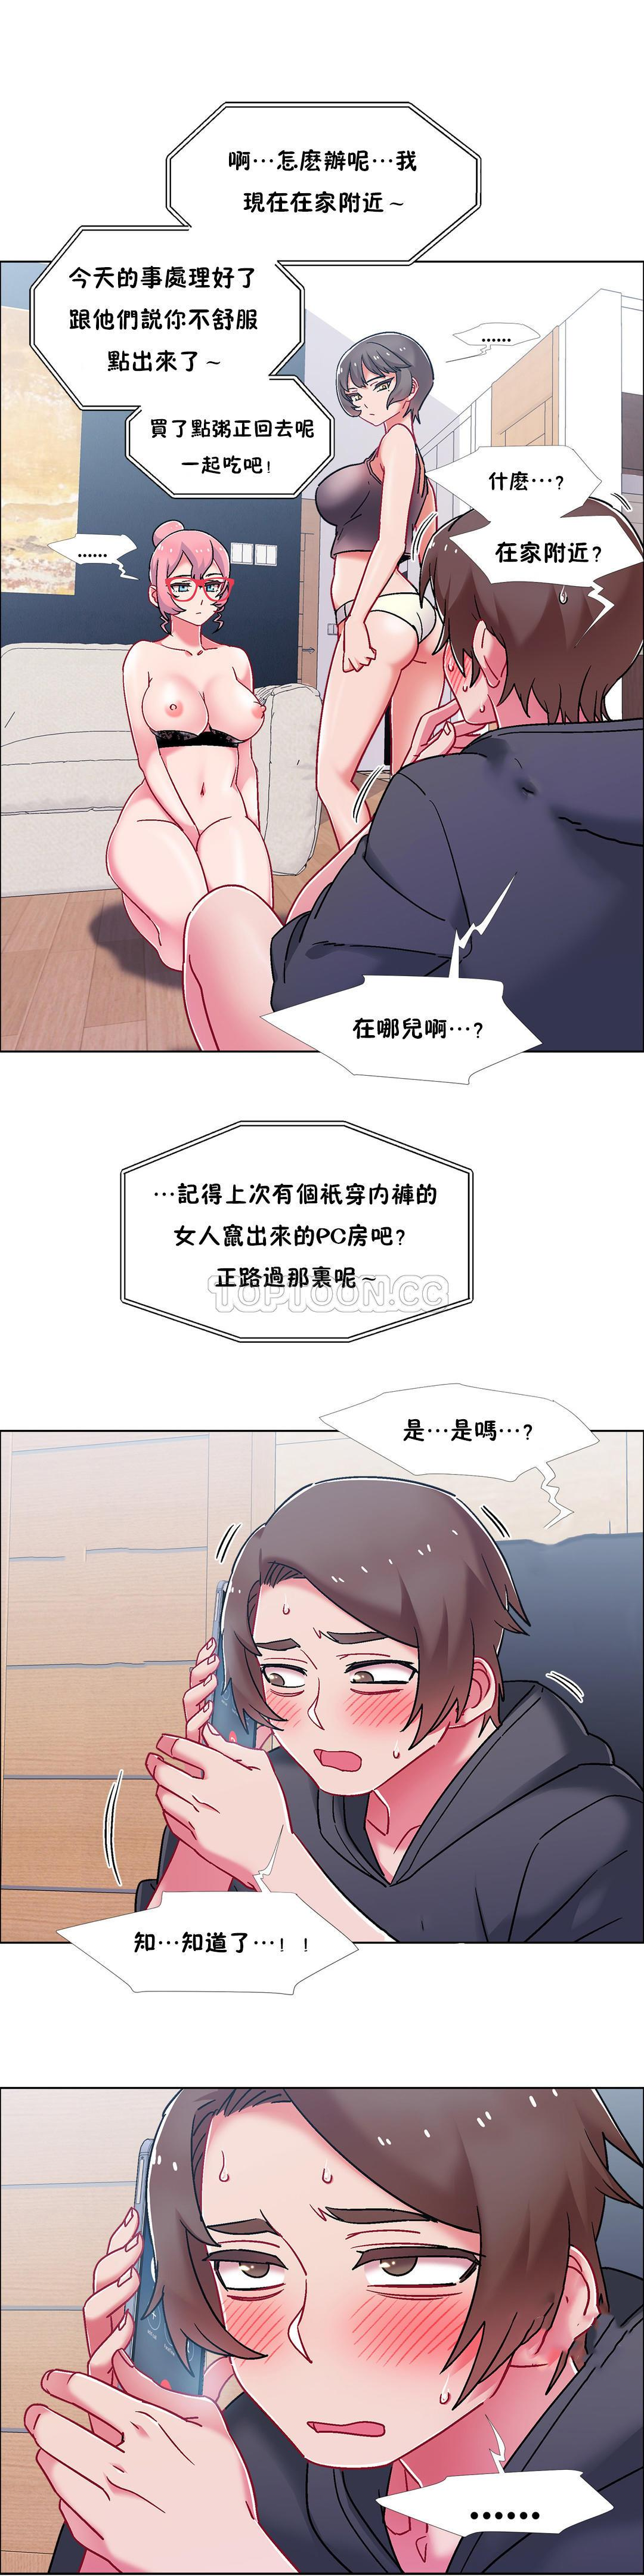 [Studio Wannabe] Rental Girls | 出租女郎 Ch. 33-58 [Chinese]  第二季 完结 389